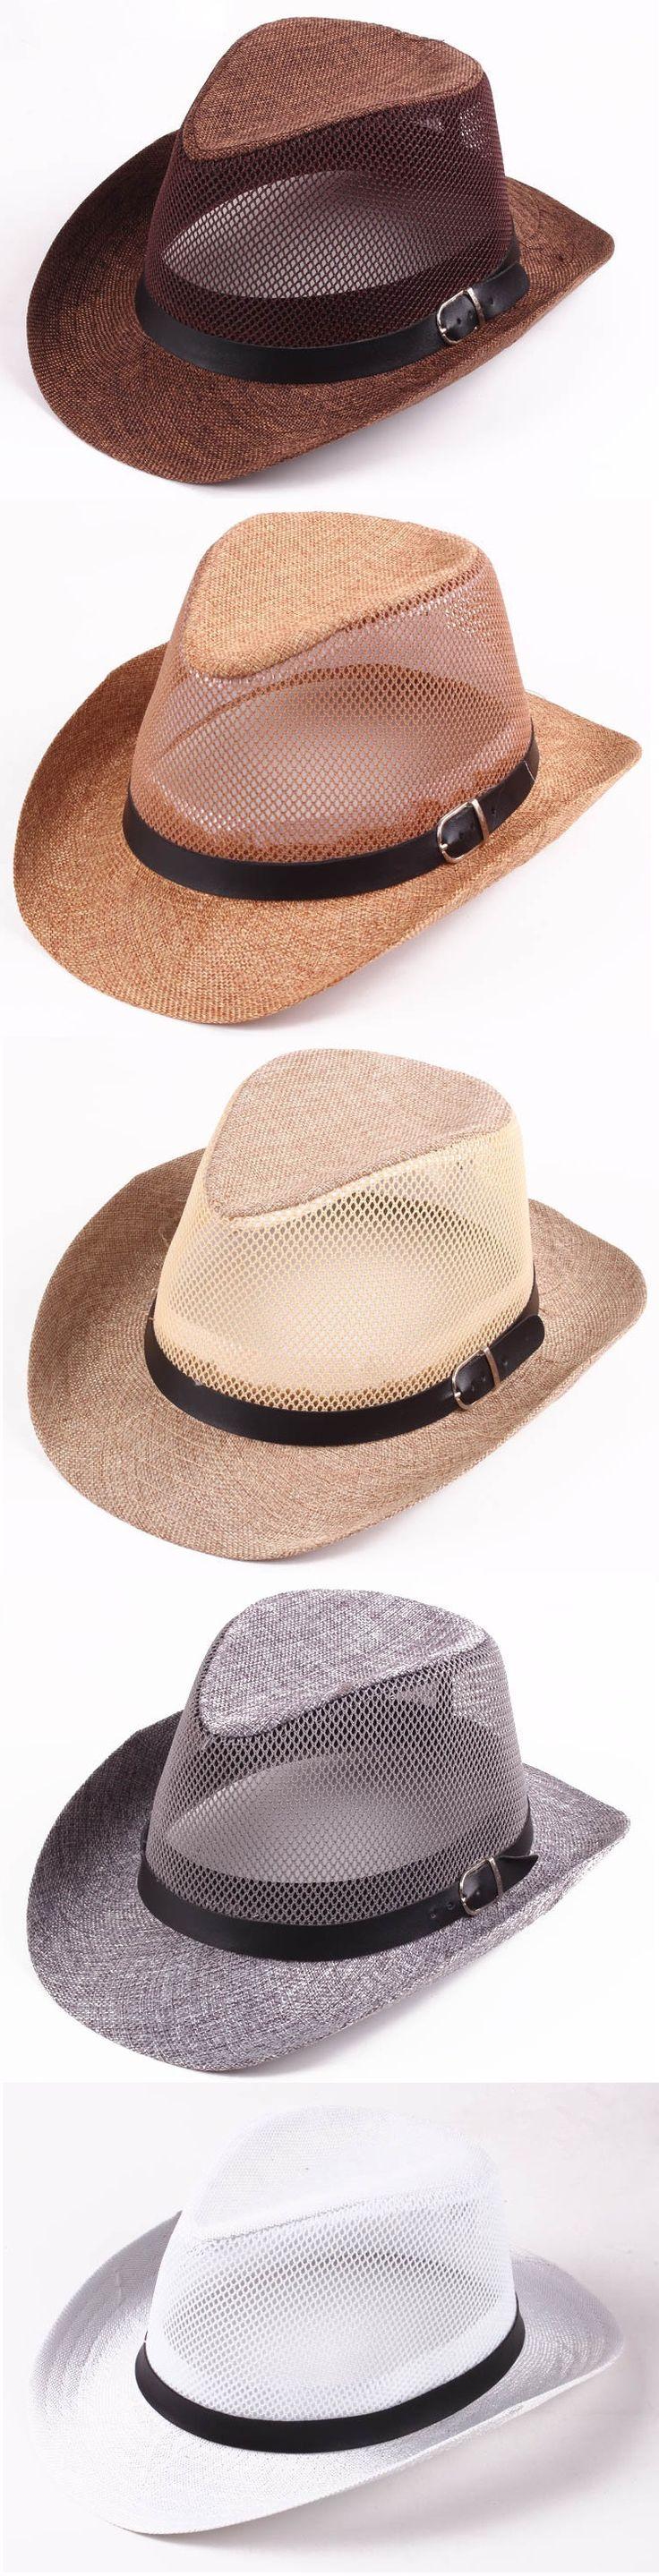 US$6.24 Men Hollow Out Mesh Top Hat Wide Brim Casual Braid Fedora Beach Sun Flax Panama Jazz Hat